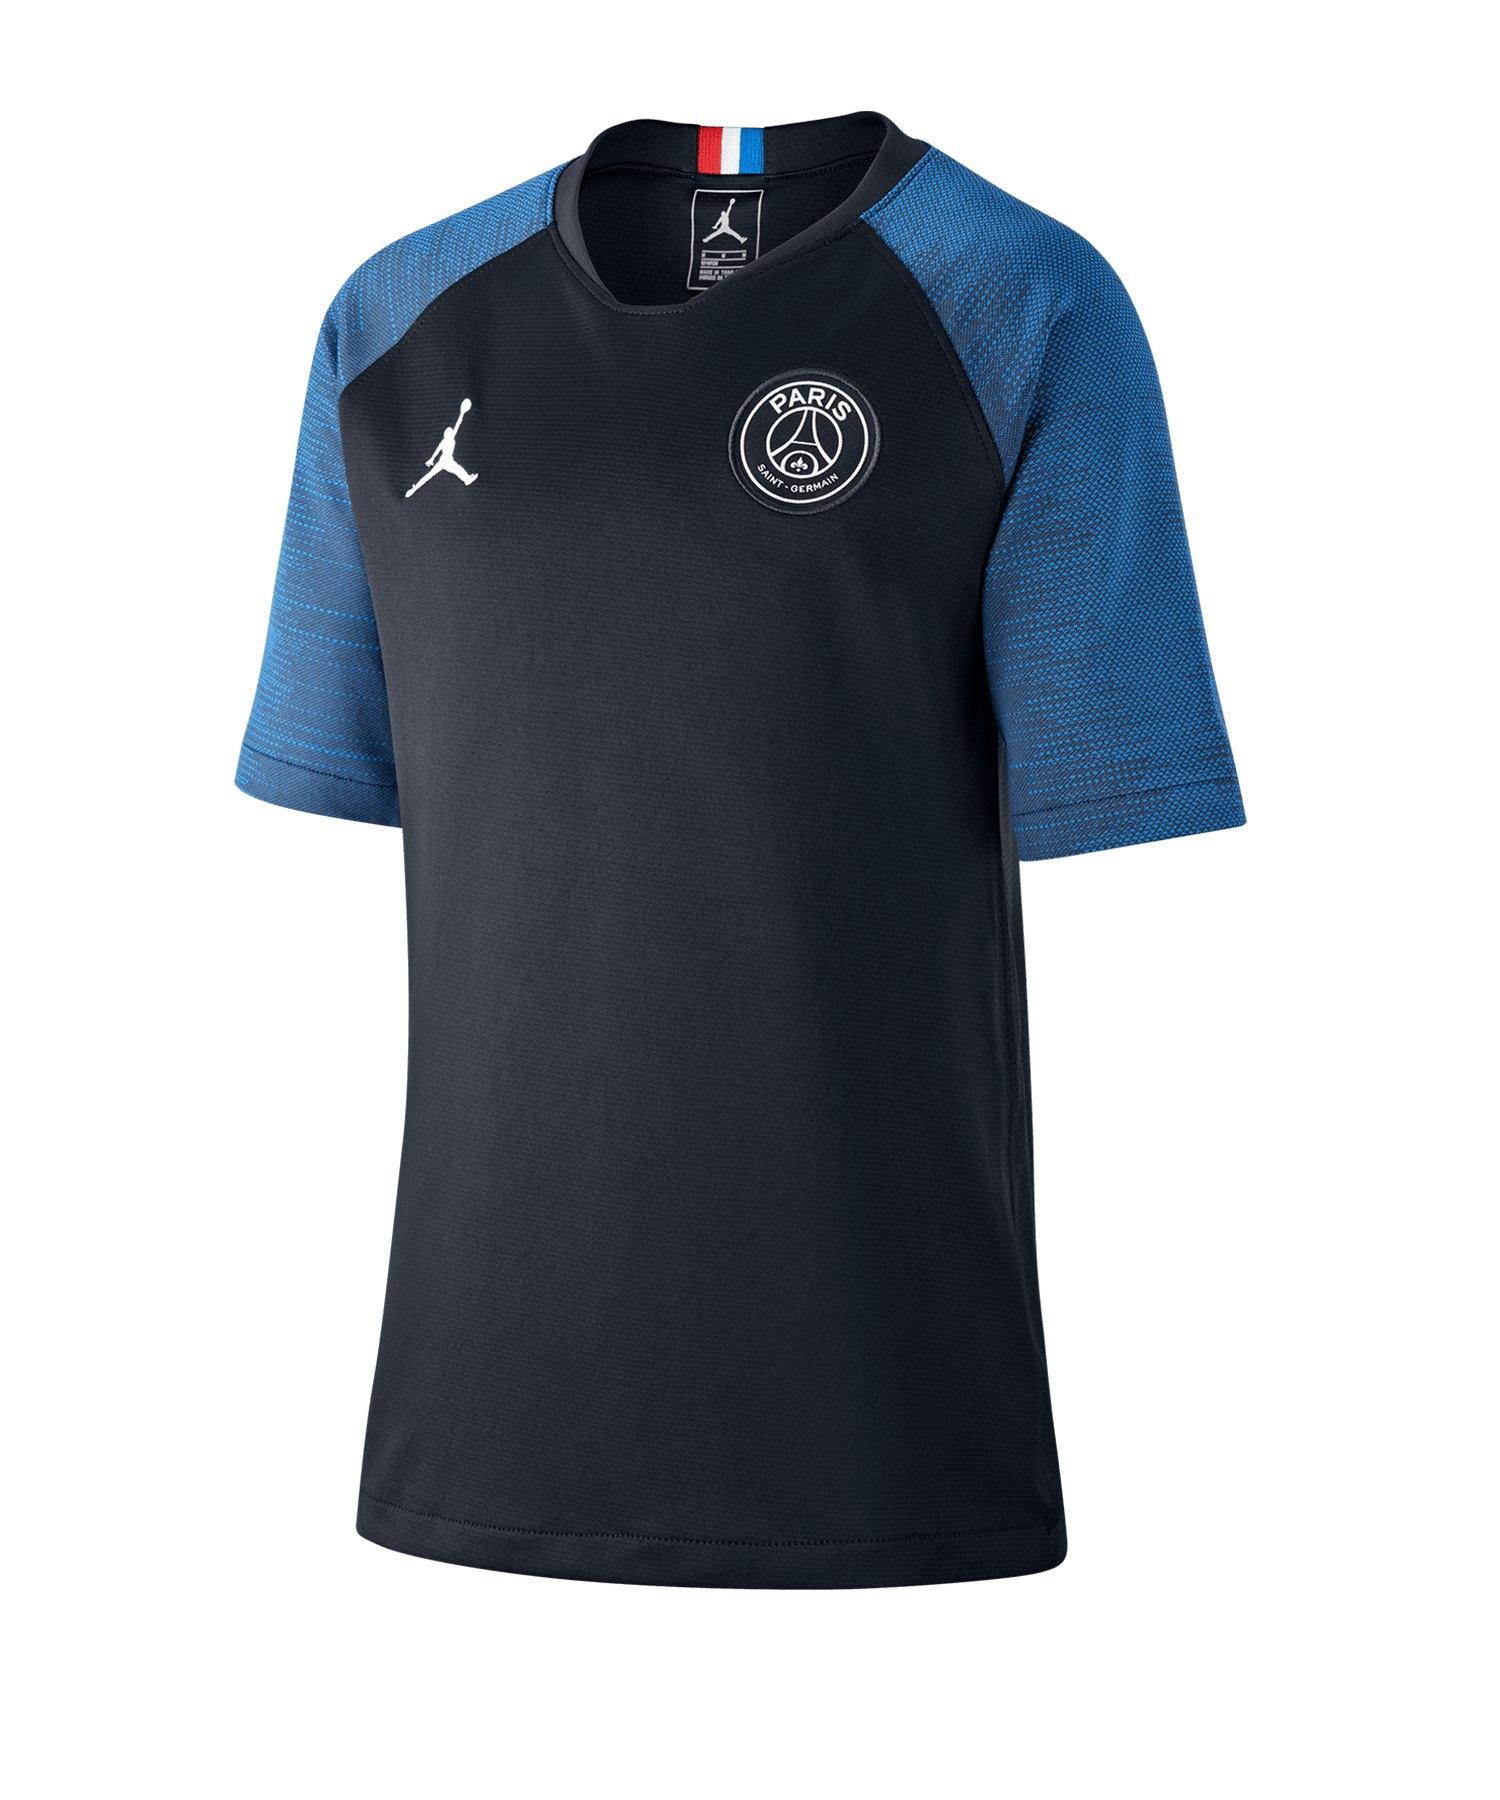 Jordan Paris St. Germain Breathe T-Shirt Kids F010 - schwarz